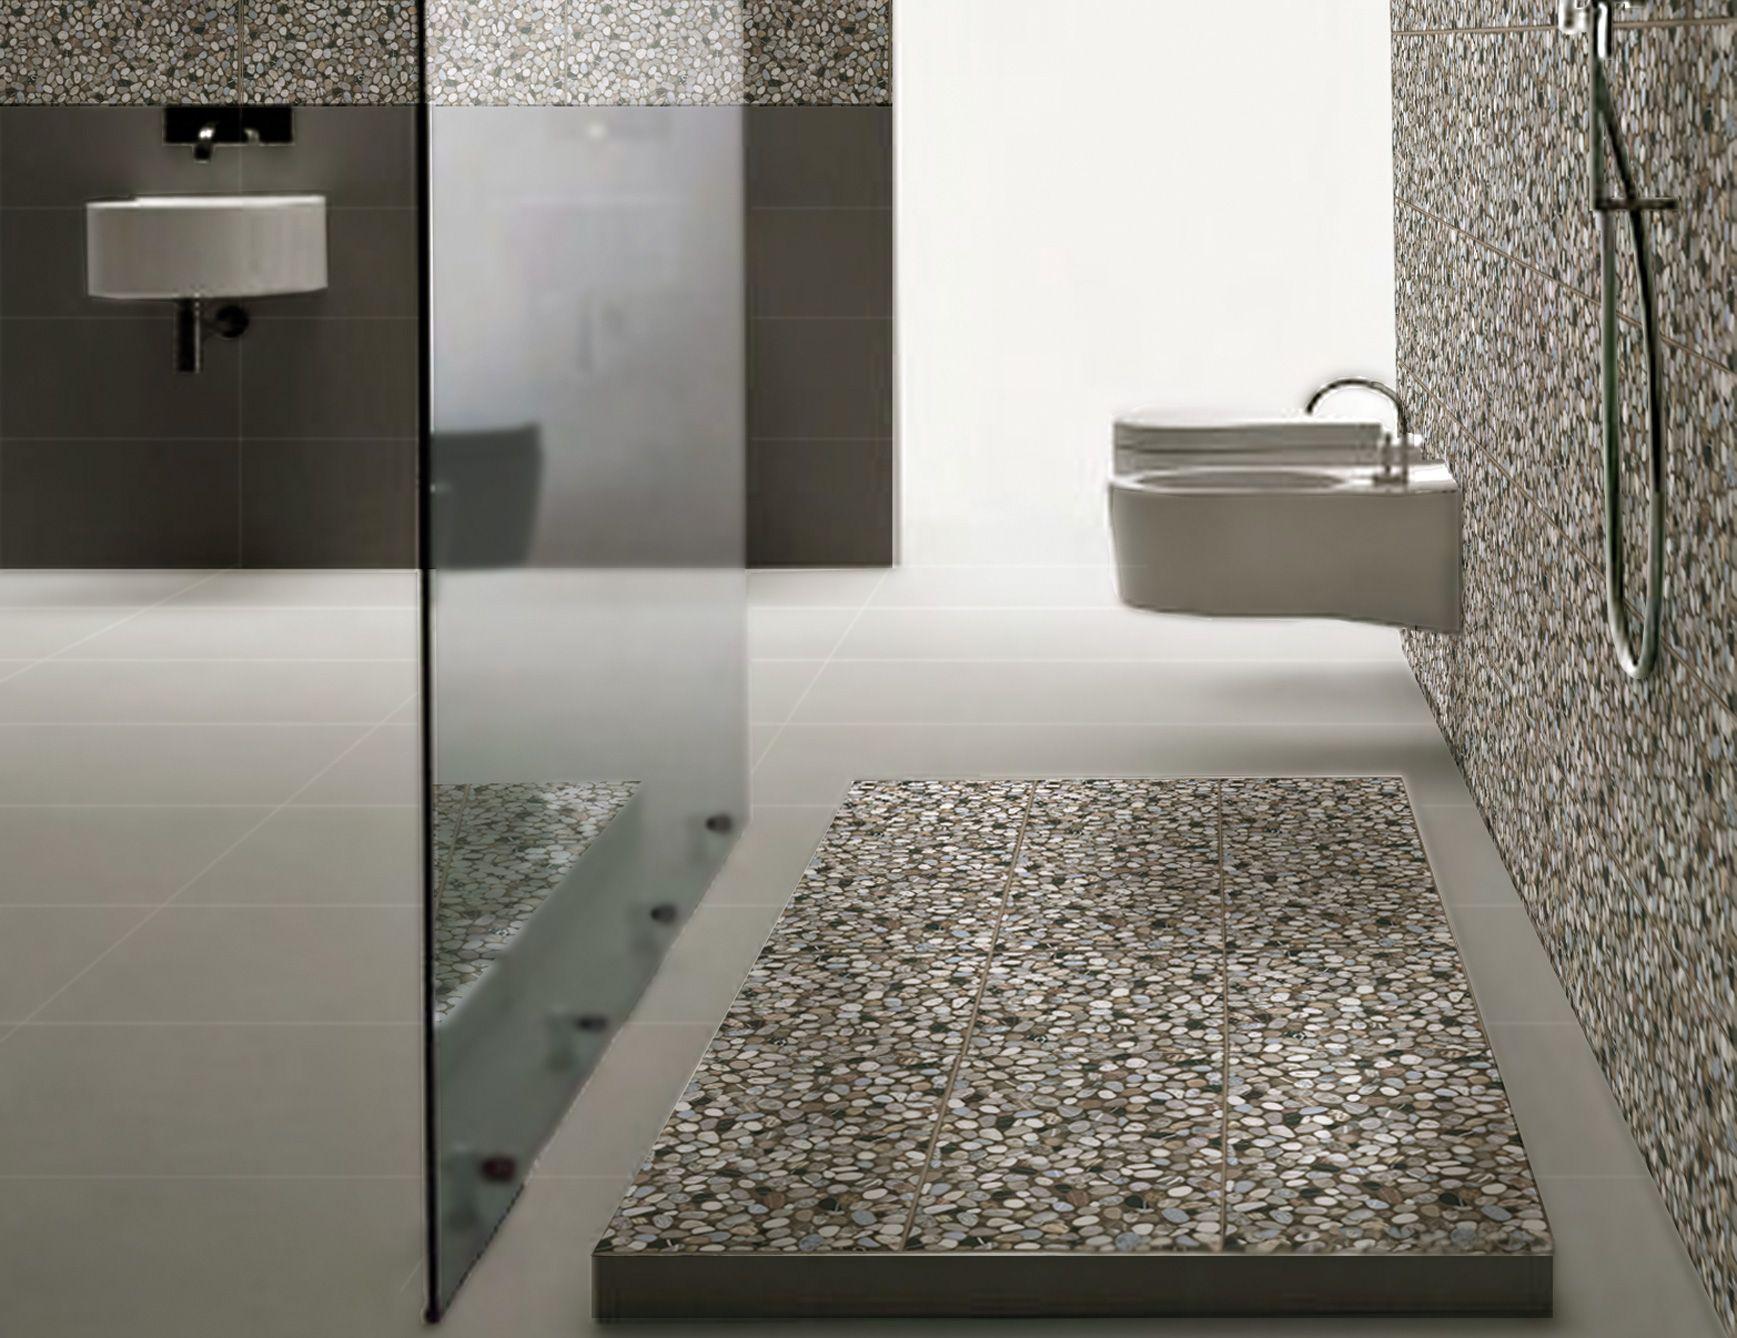 18 Zeitgenossische Badezimmer Bodenbelag Ideen Mit Bildern Bodenfliesen Bad Ideen Bodenbelag Badezimmerboden